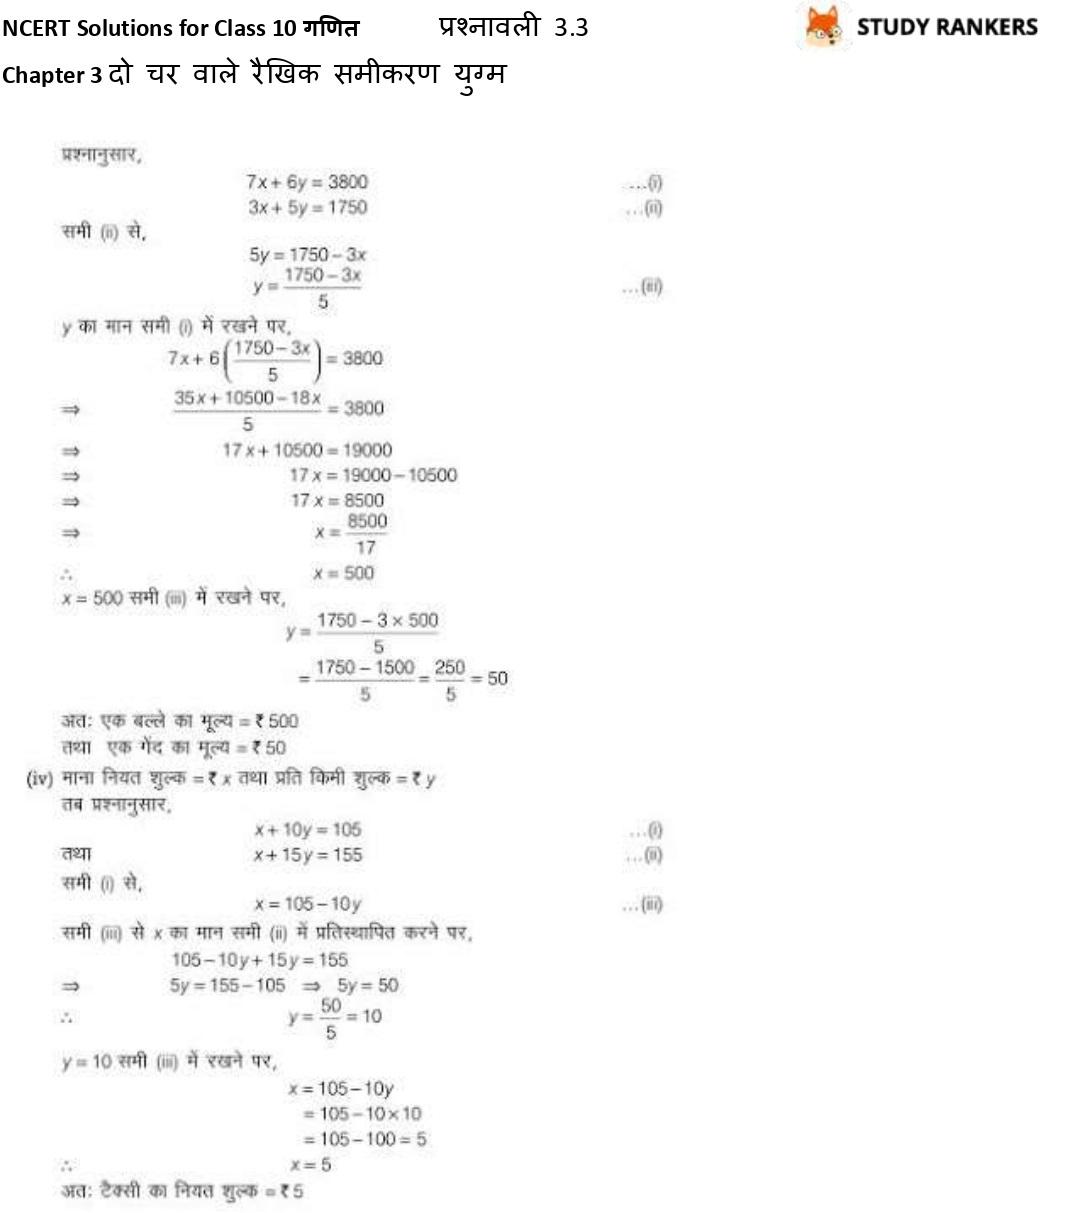 NCERT Solutions for Class 10 Maths Chapter 3 दो चर वाले रैखिक समीकरण युग्म प्रश्नावली 3.3 Part 6